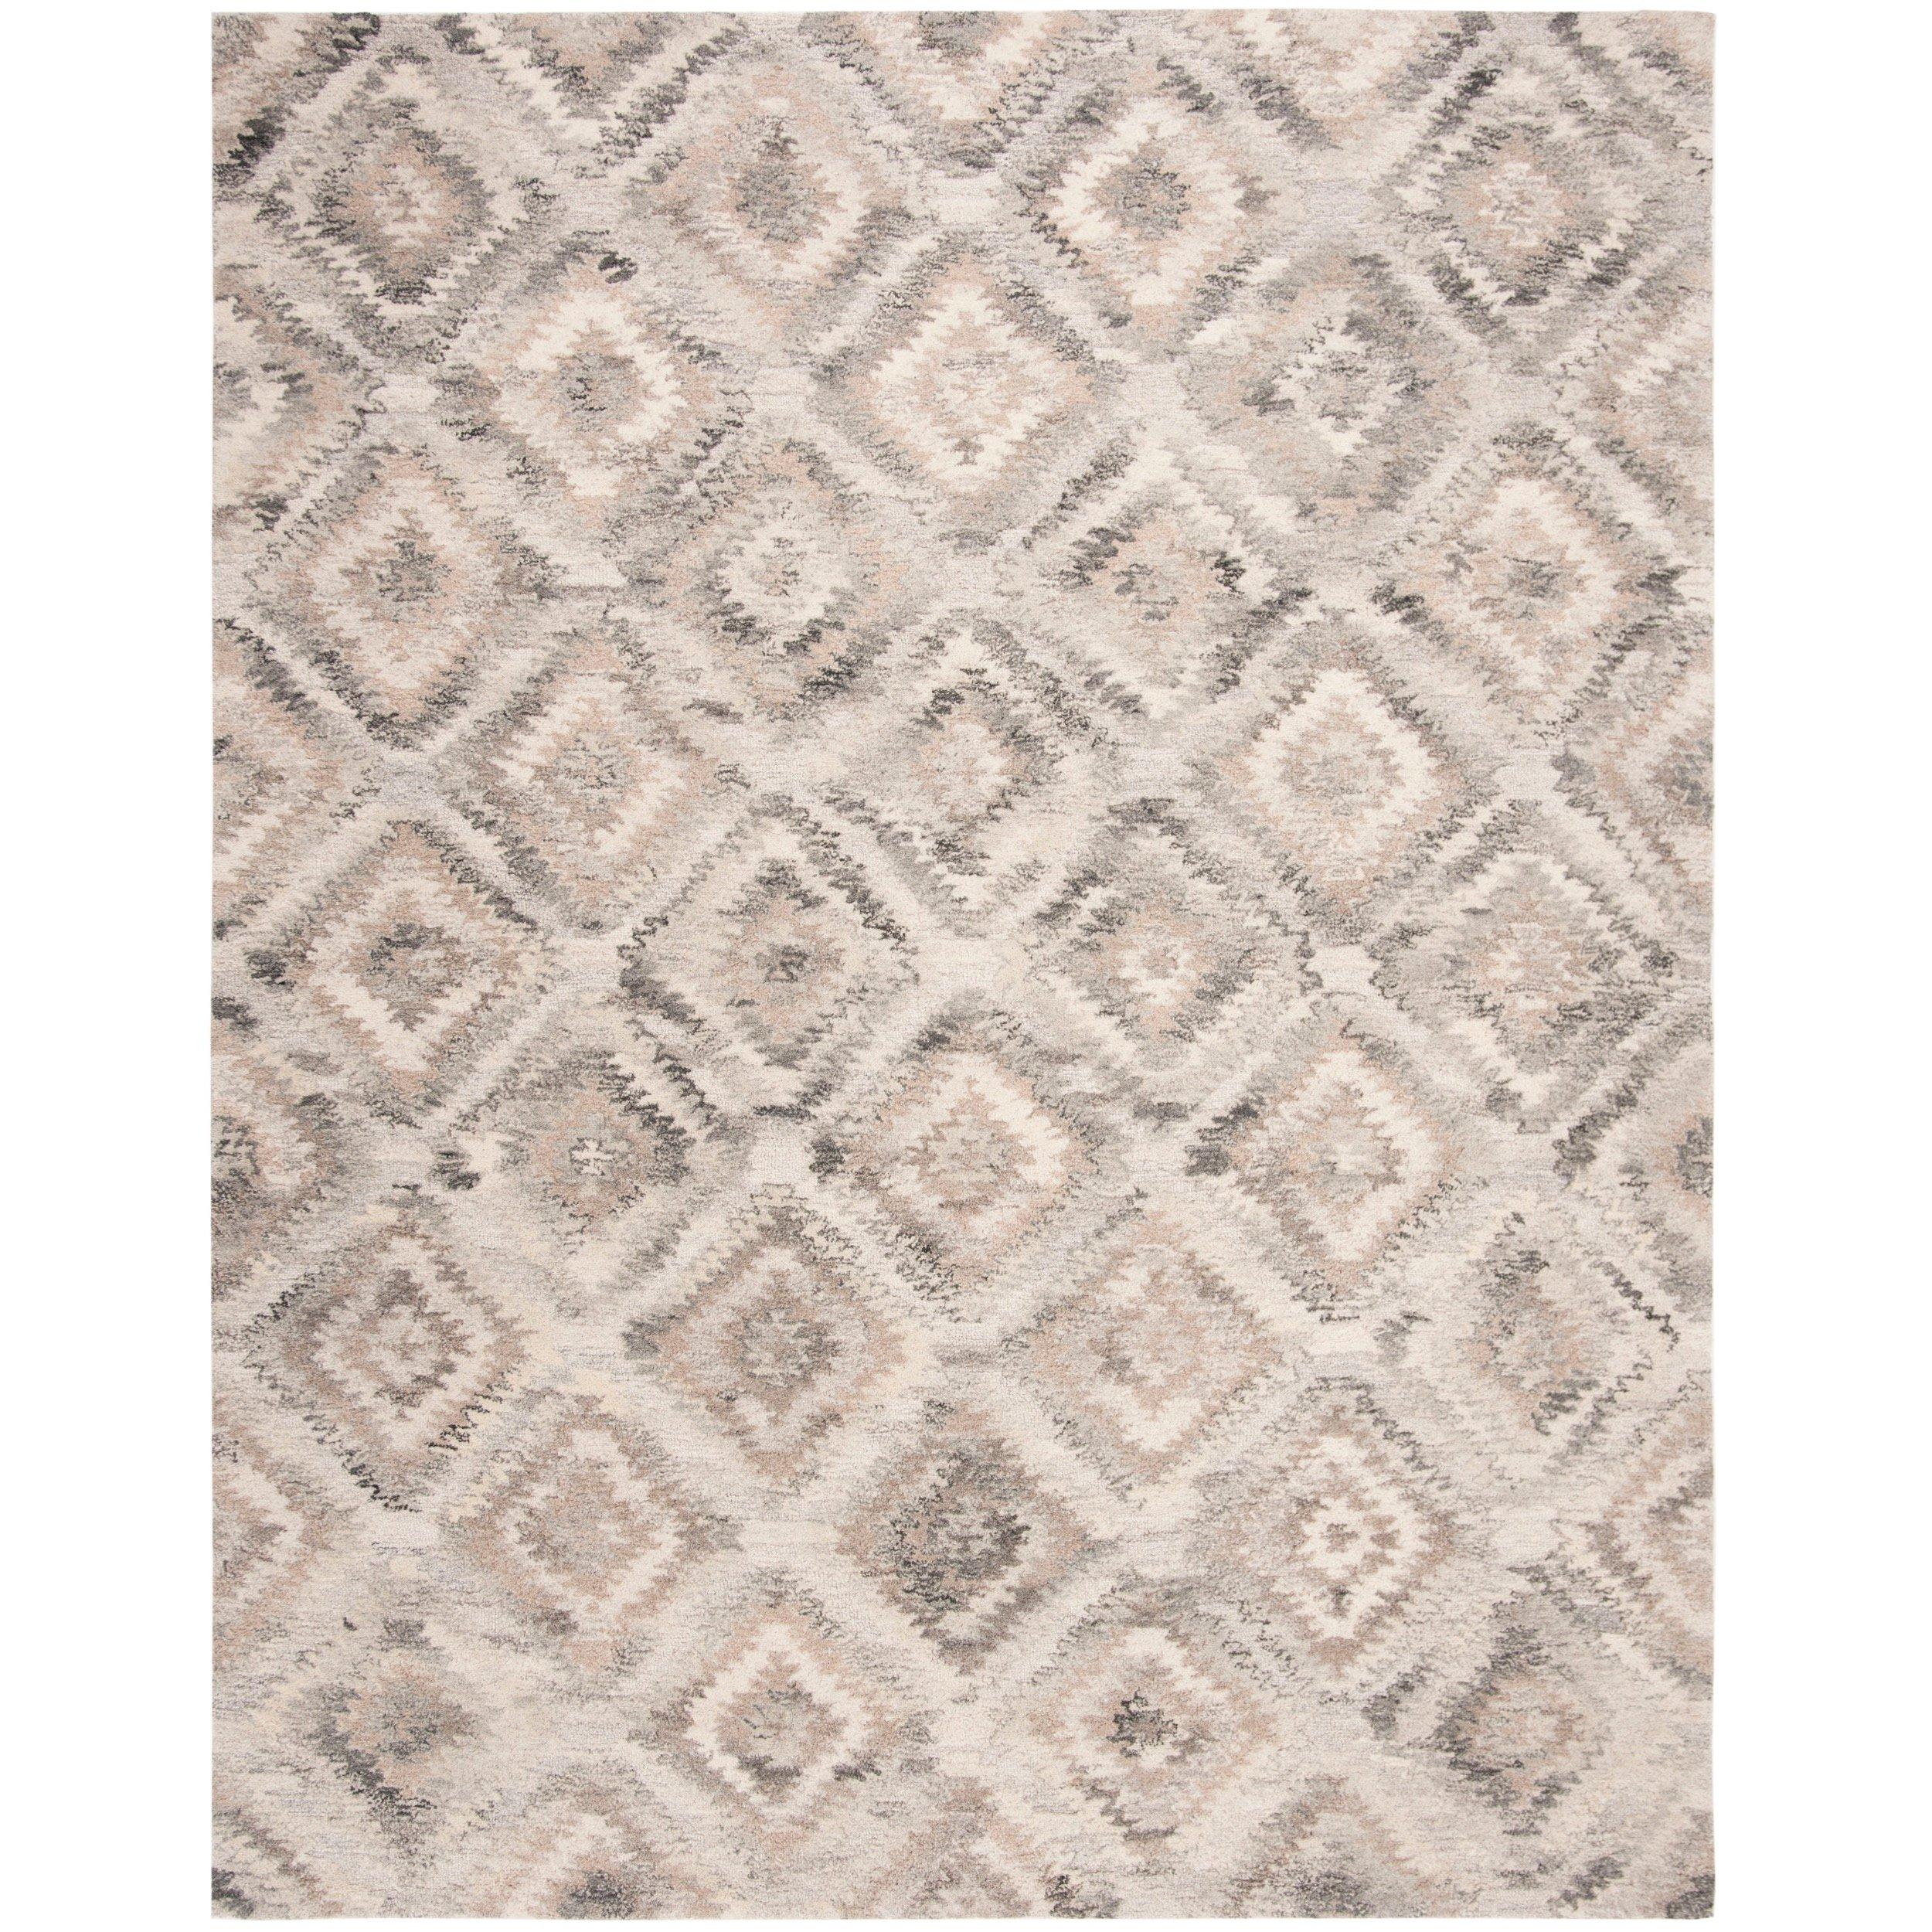 Safavieh Handmade Wyndham Modern Contemporary Grey Taupe Wool